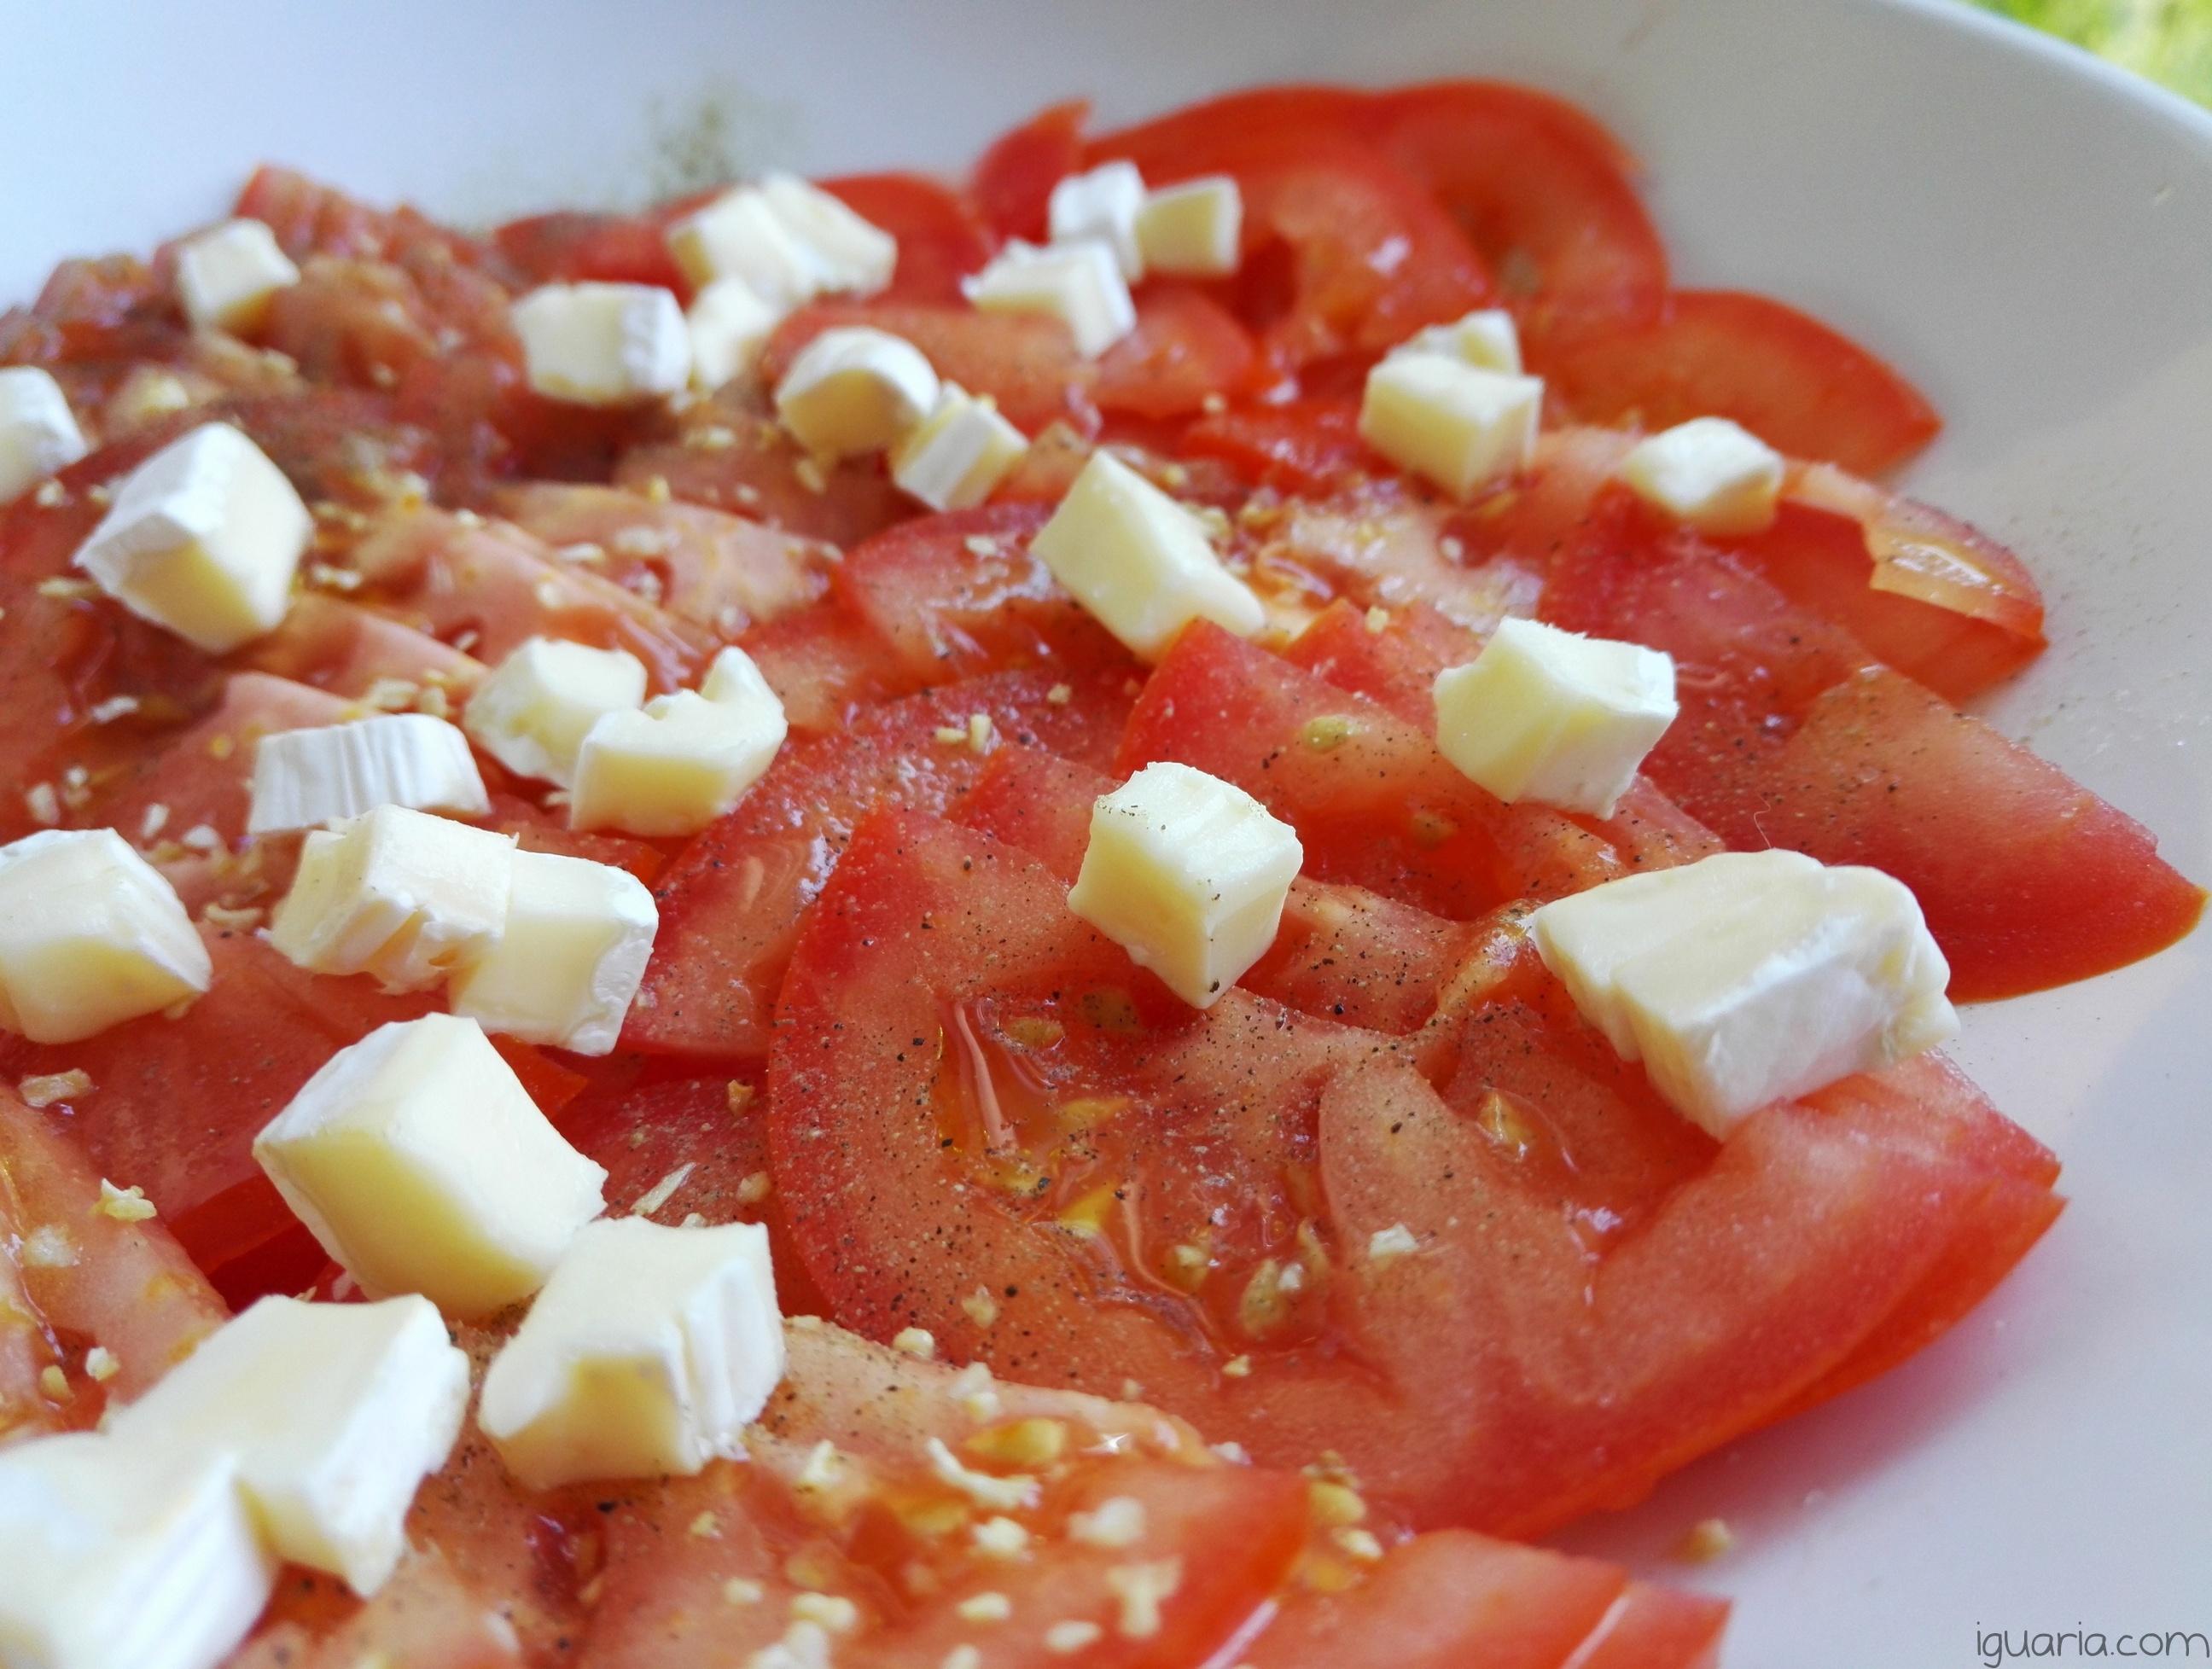 Iguaria_Salada-Temperada-Tomate-e-Brie